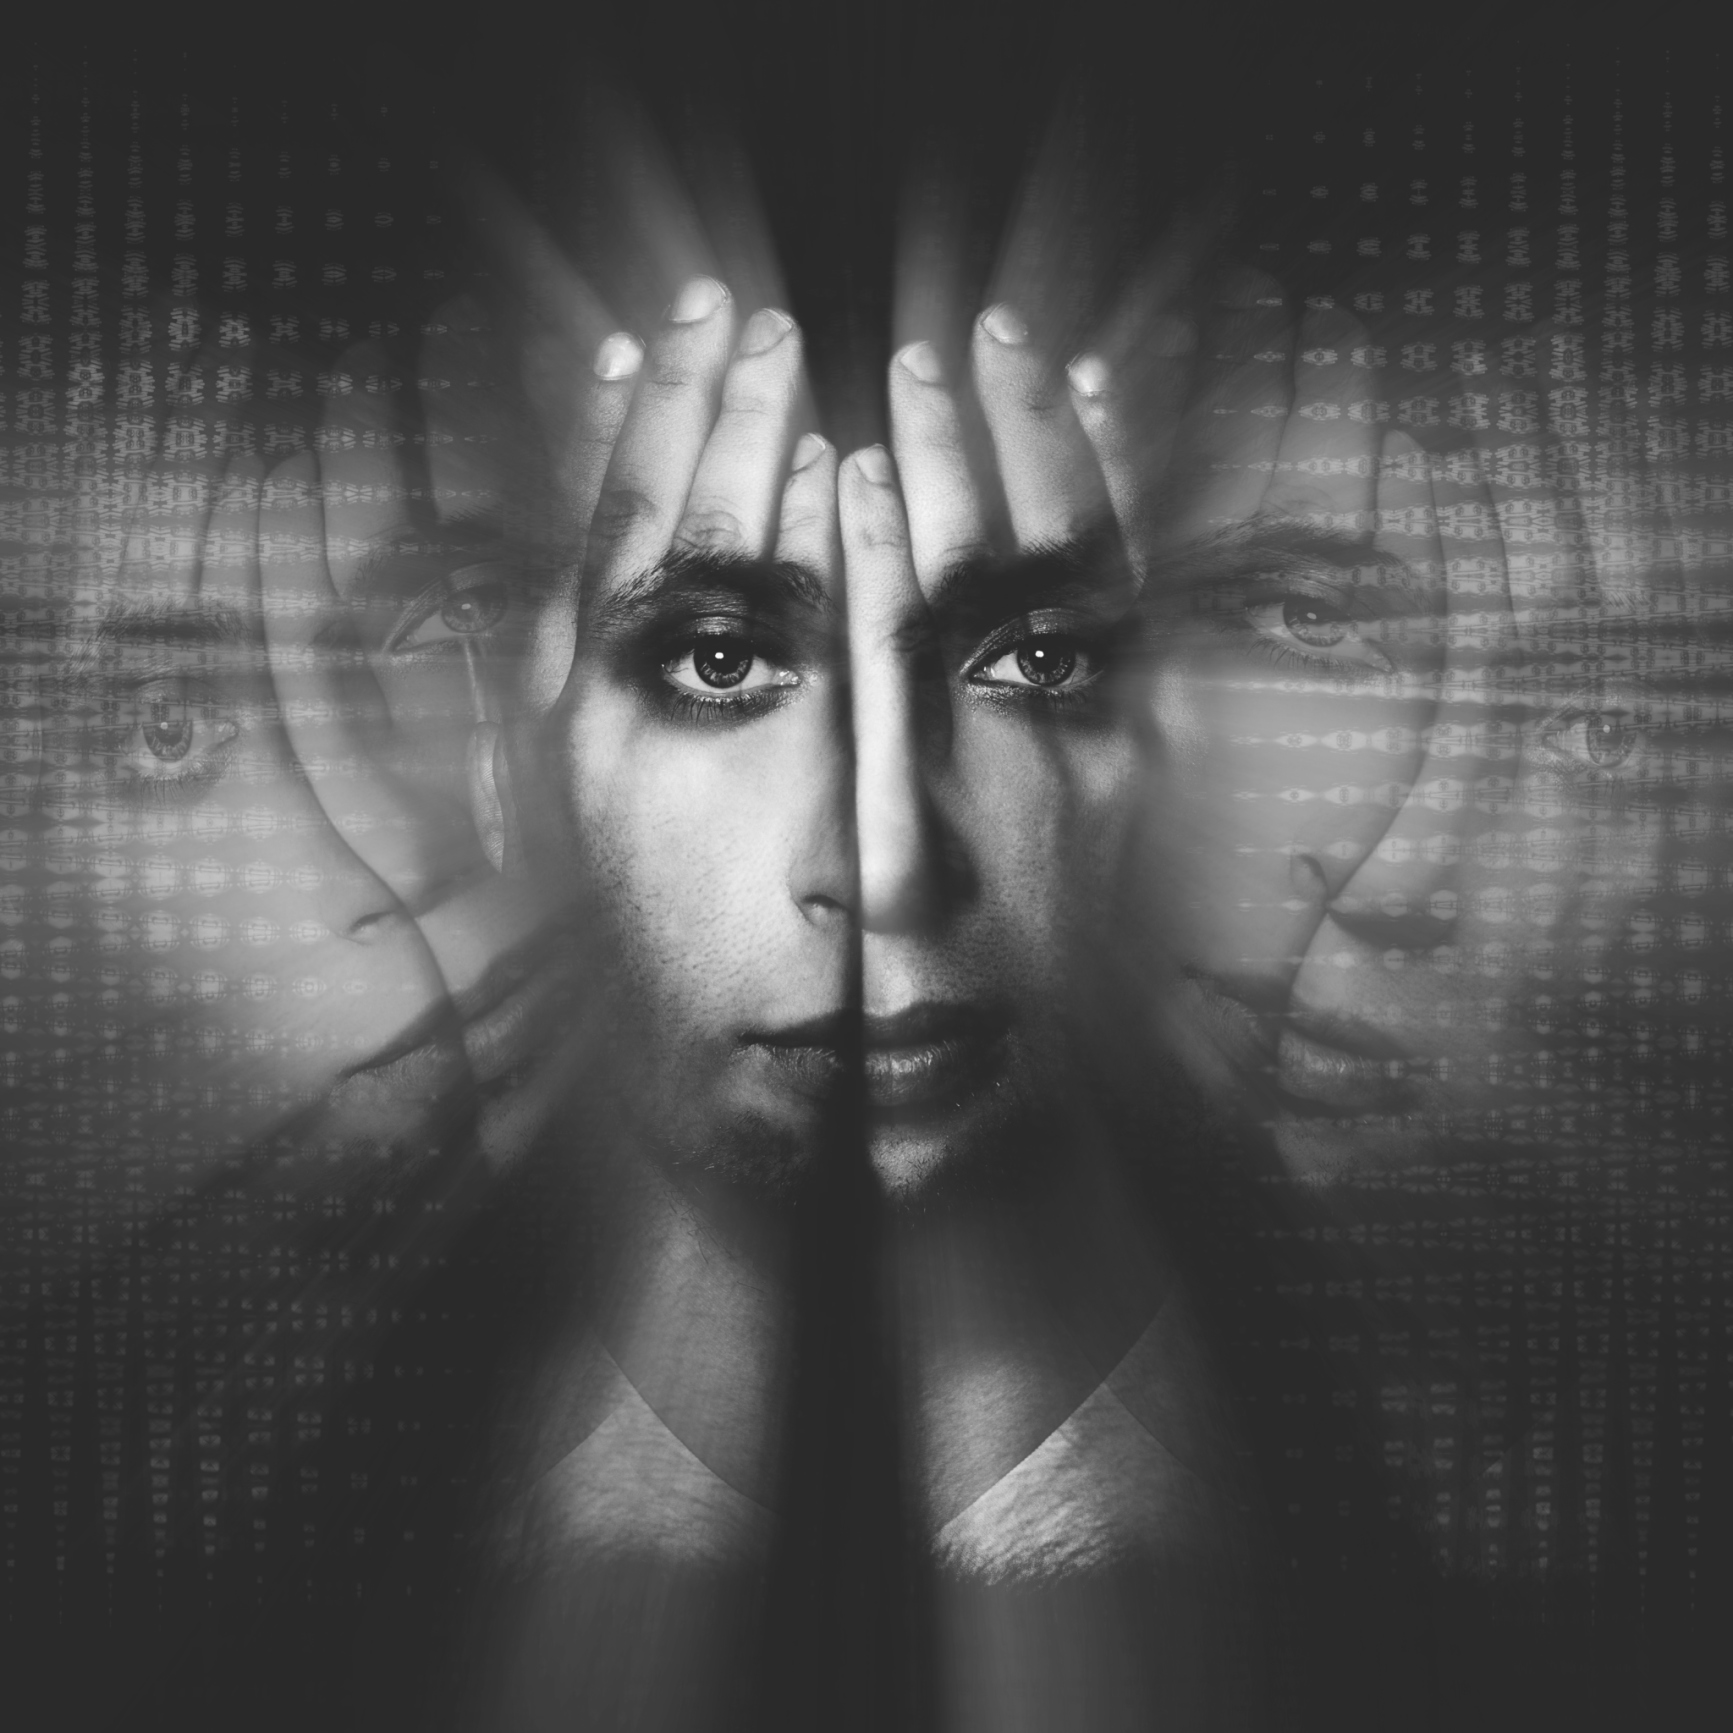 schizophrenia - photo #47